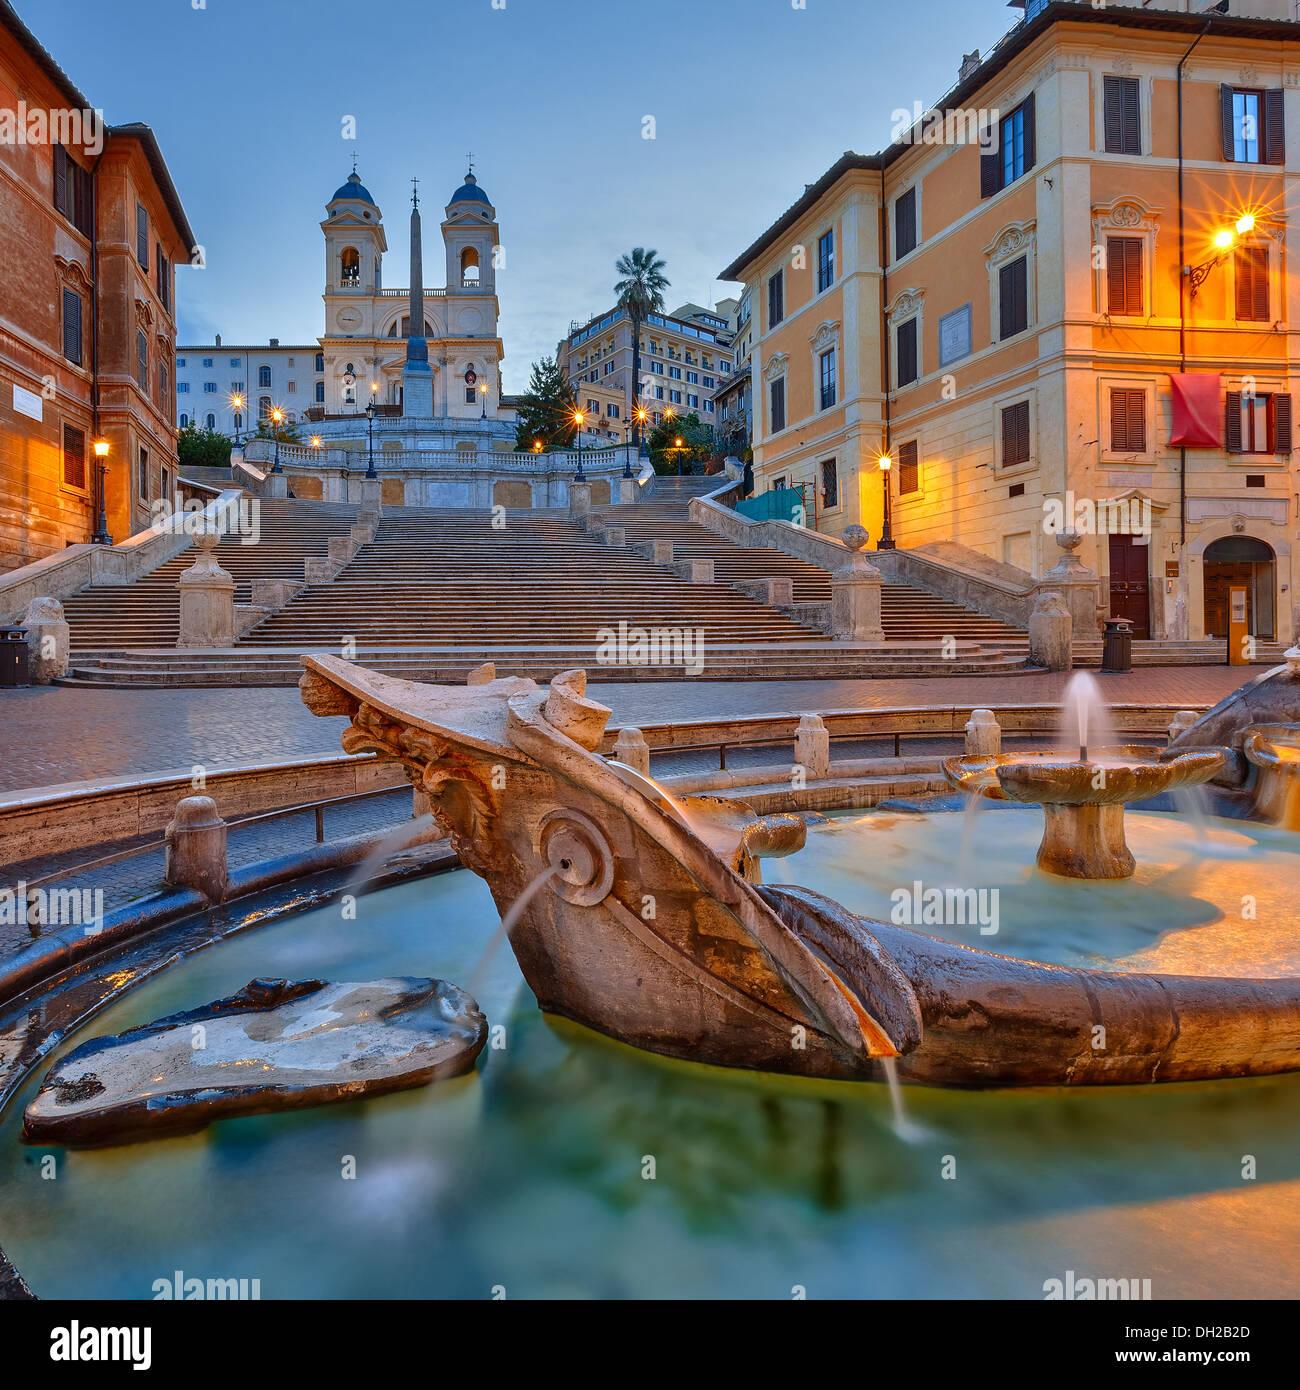 Spanish Steps at dusk, Rome - Stock Image